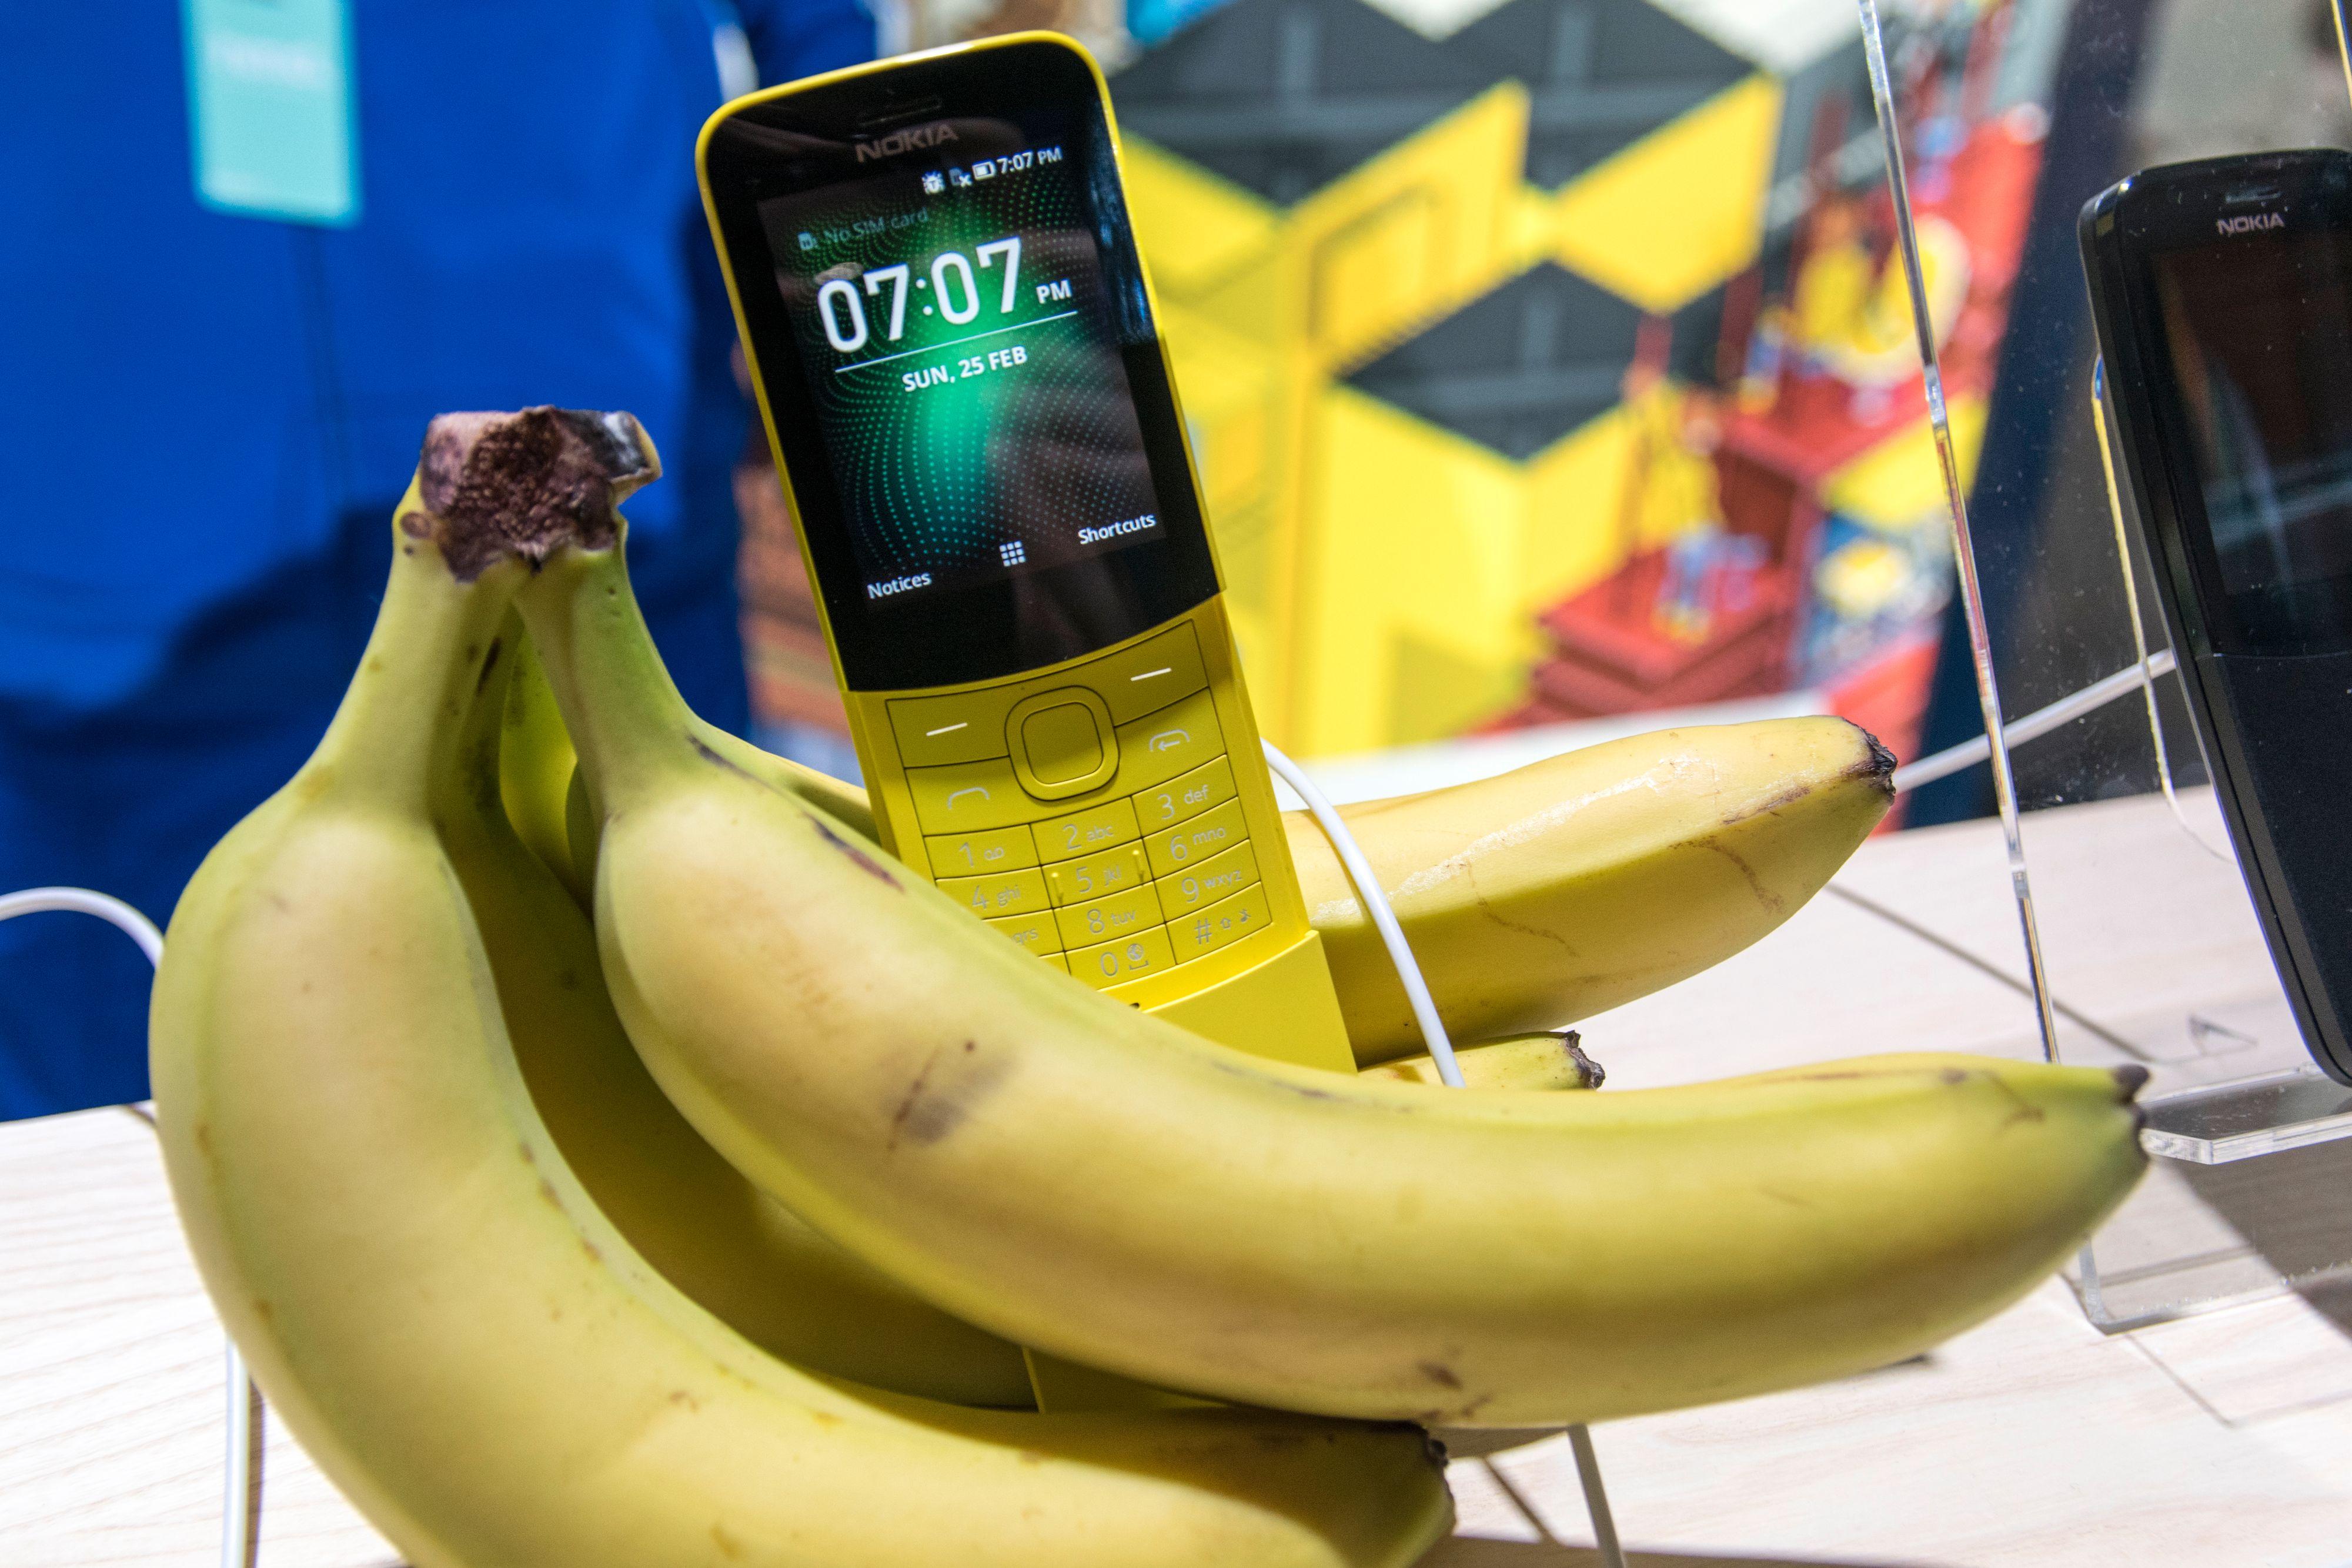 Bananer i lange baner. Vi måtte selvsagt ta vårt eget bananbilde med Nokia 8110.